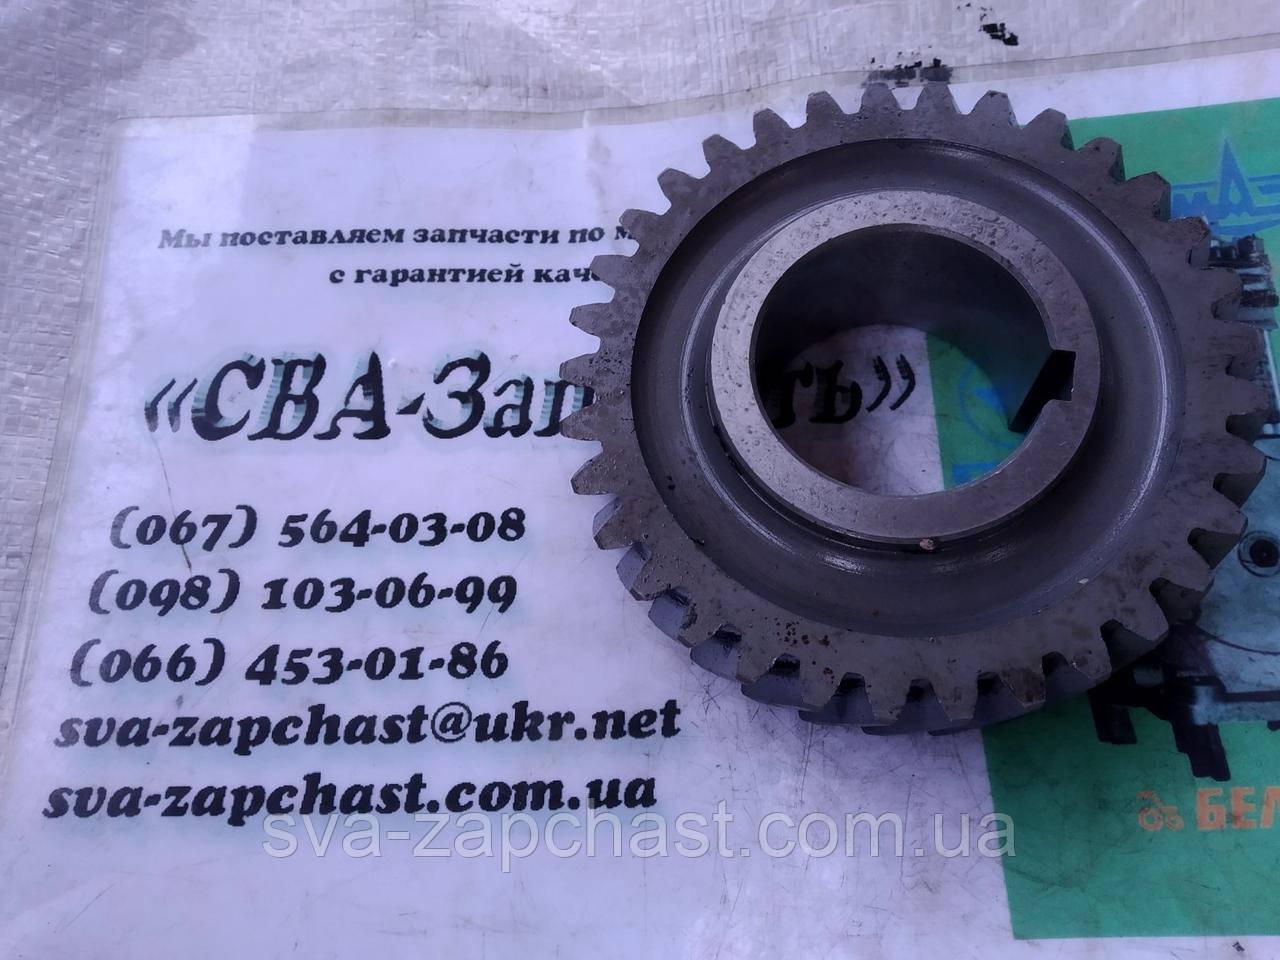 Шестерня КПП ПАЗ ЗИЛ МАЗ 33зуб. третьей передачи промежуточного вала 320570-1701051-10